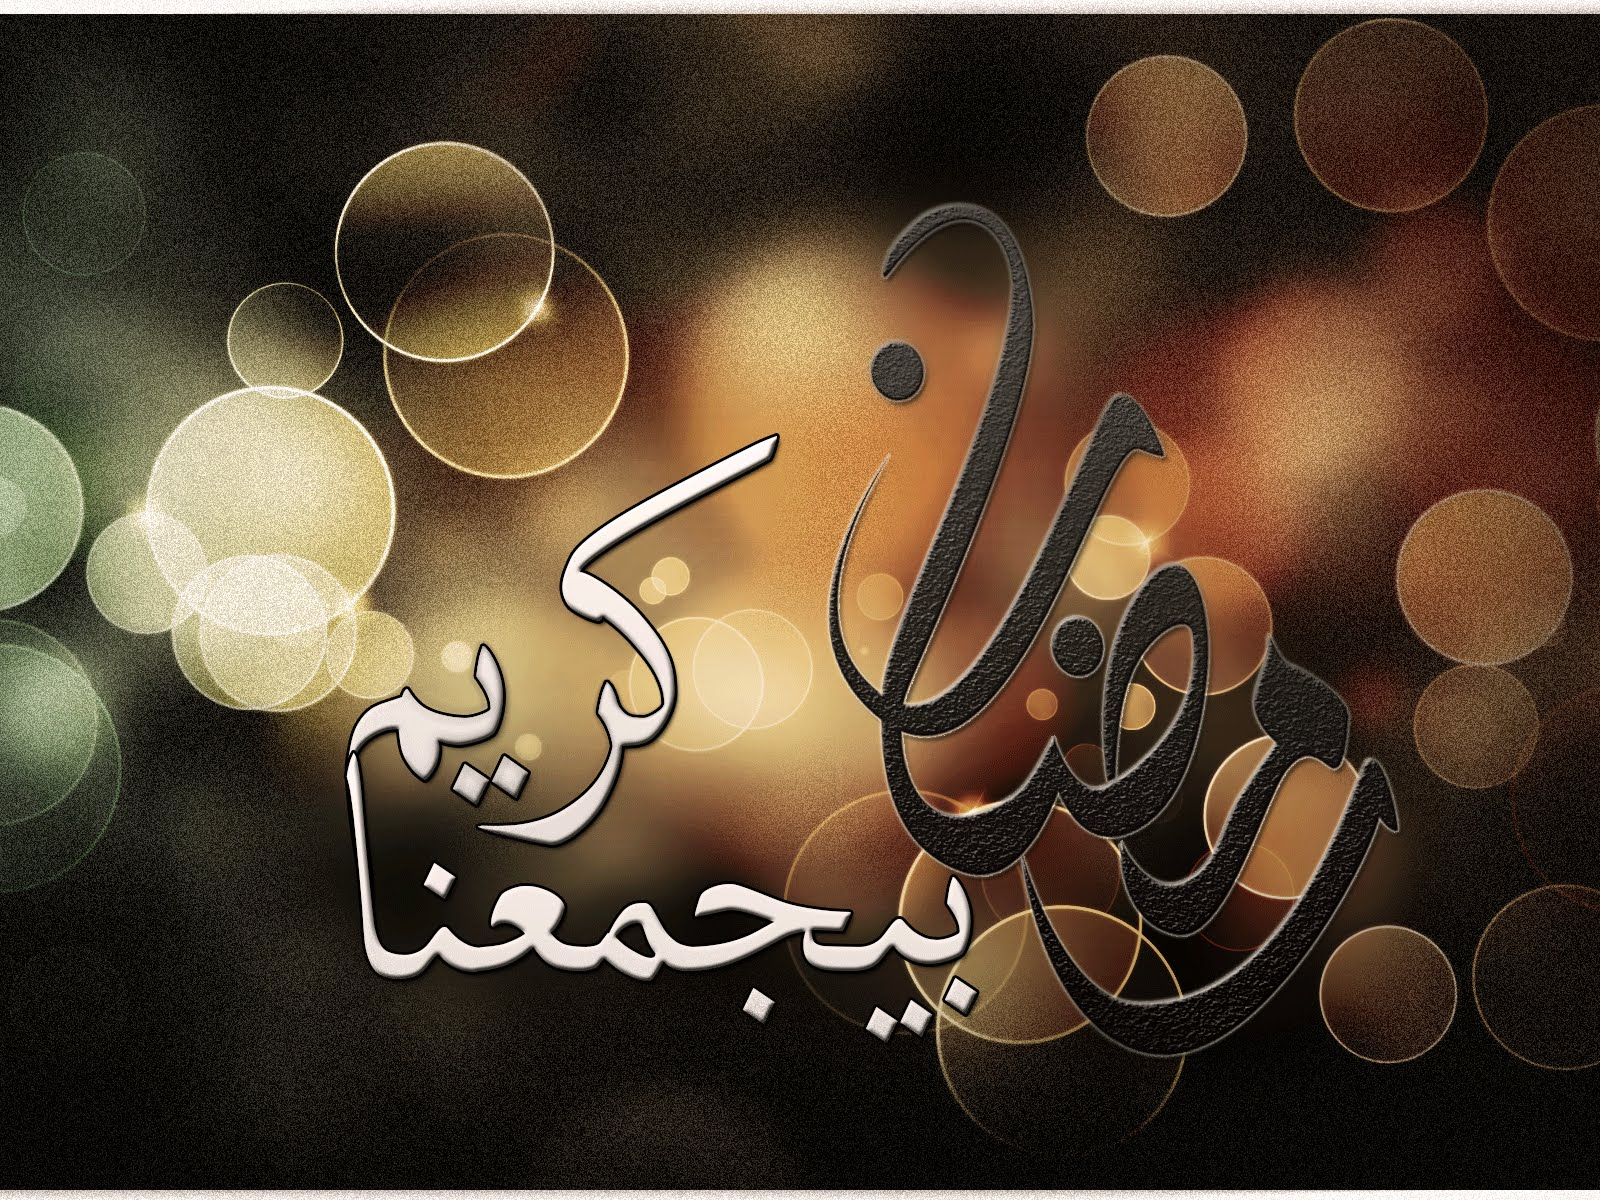 بالصور خلفيات عن رمضان , اجمل الخلفيات لاجمل شهر فى السنه شهر رمضان 5999 8